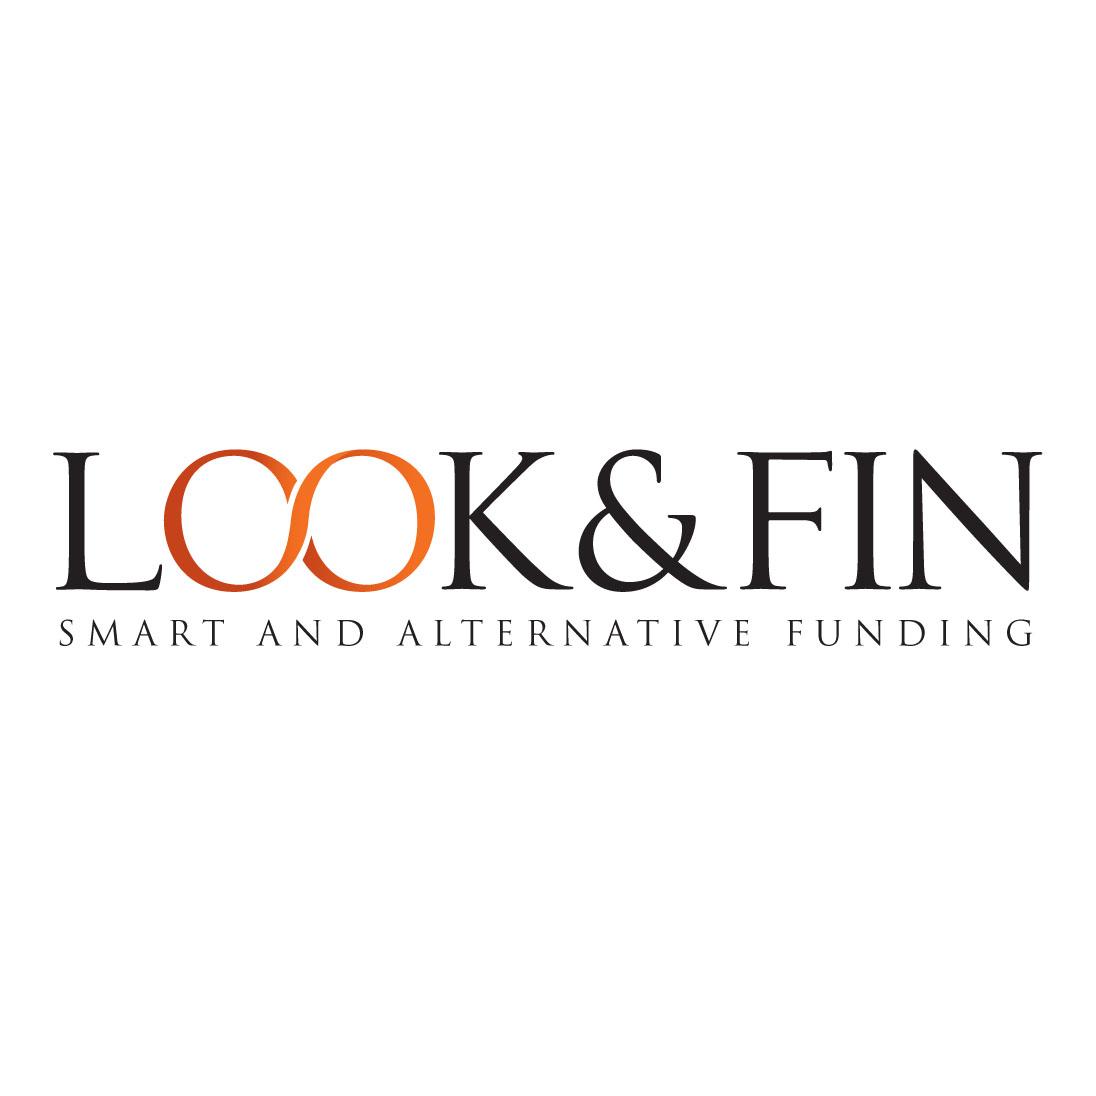 Look & Fin